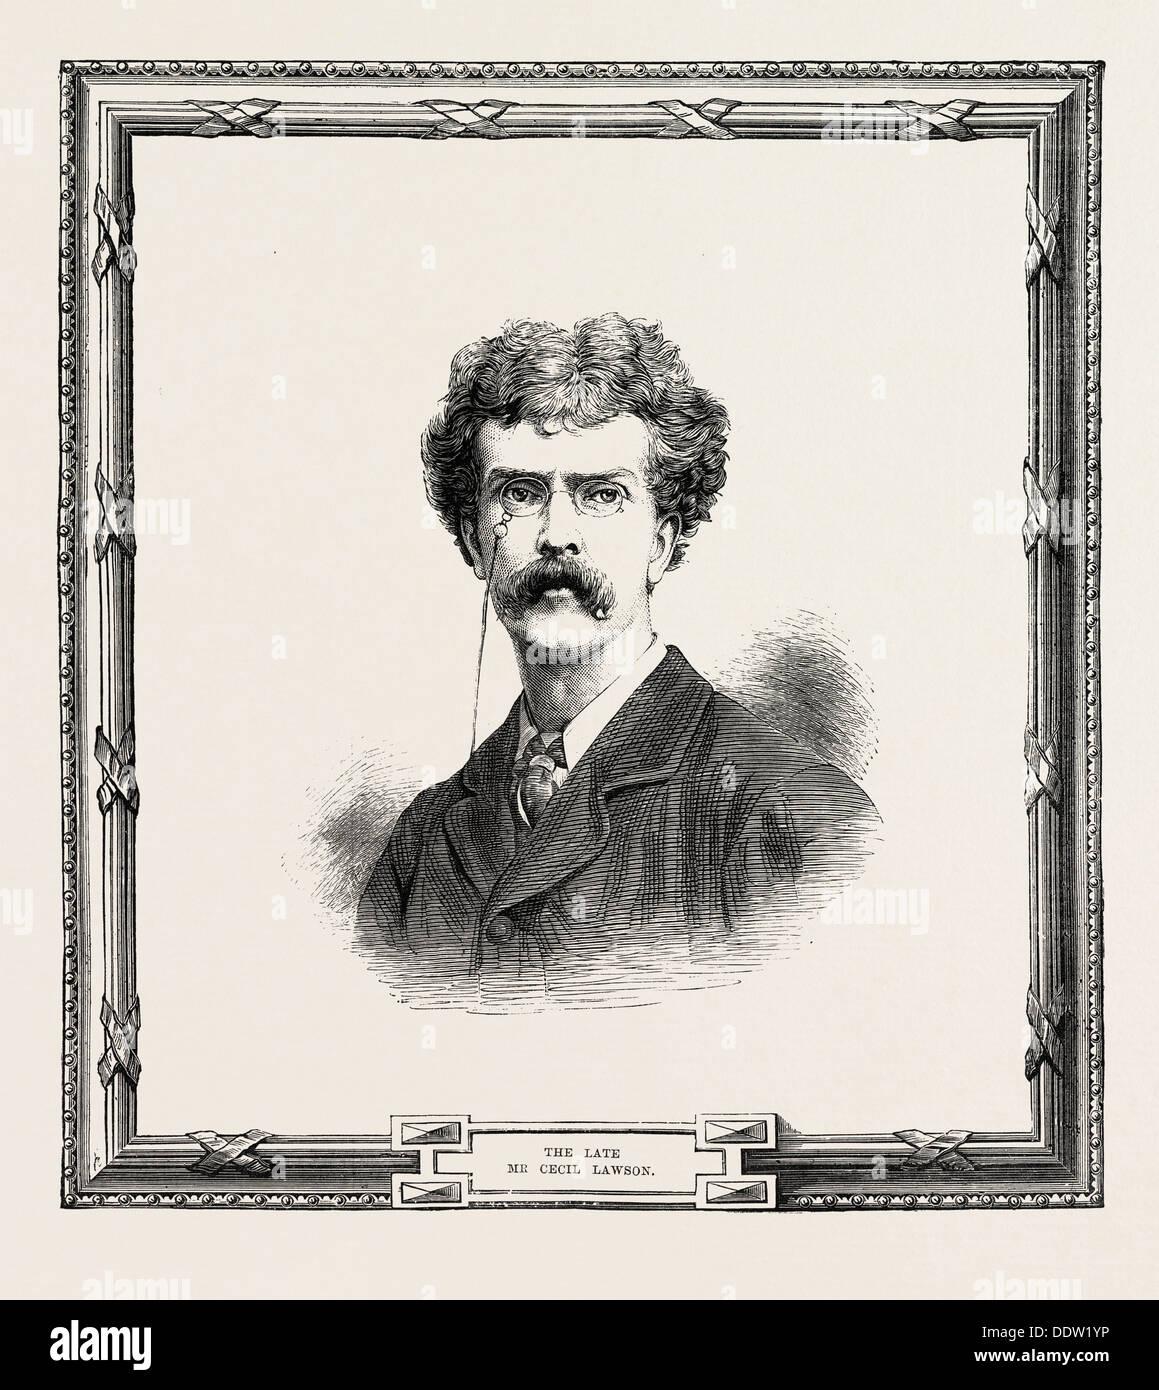 Cecil Gordon Lawson December 3, 1851 - June 10, 1882, was an English landscape painter, ENGRAVING 1882, UK, britain, british - Stock Image